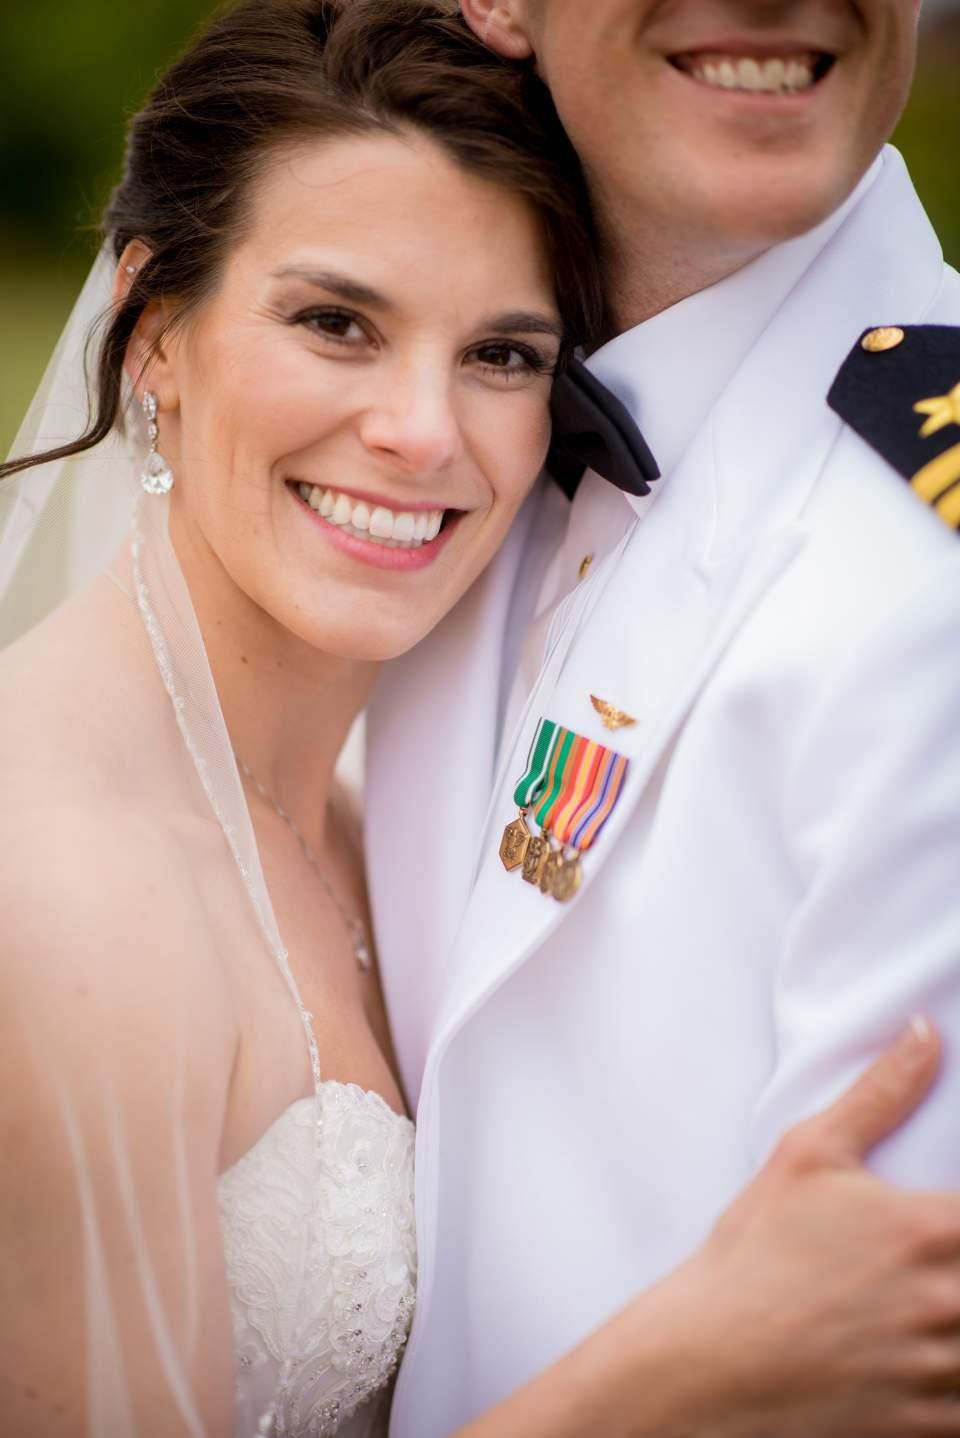 bride close up hugging groom